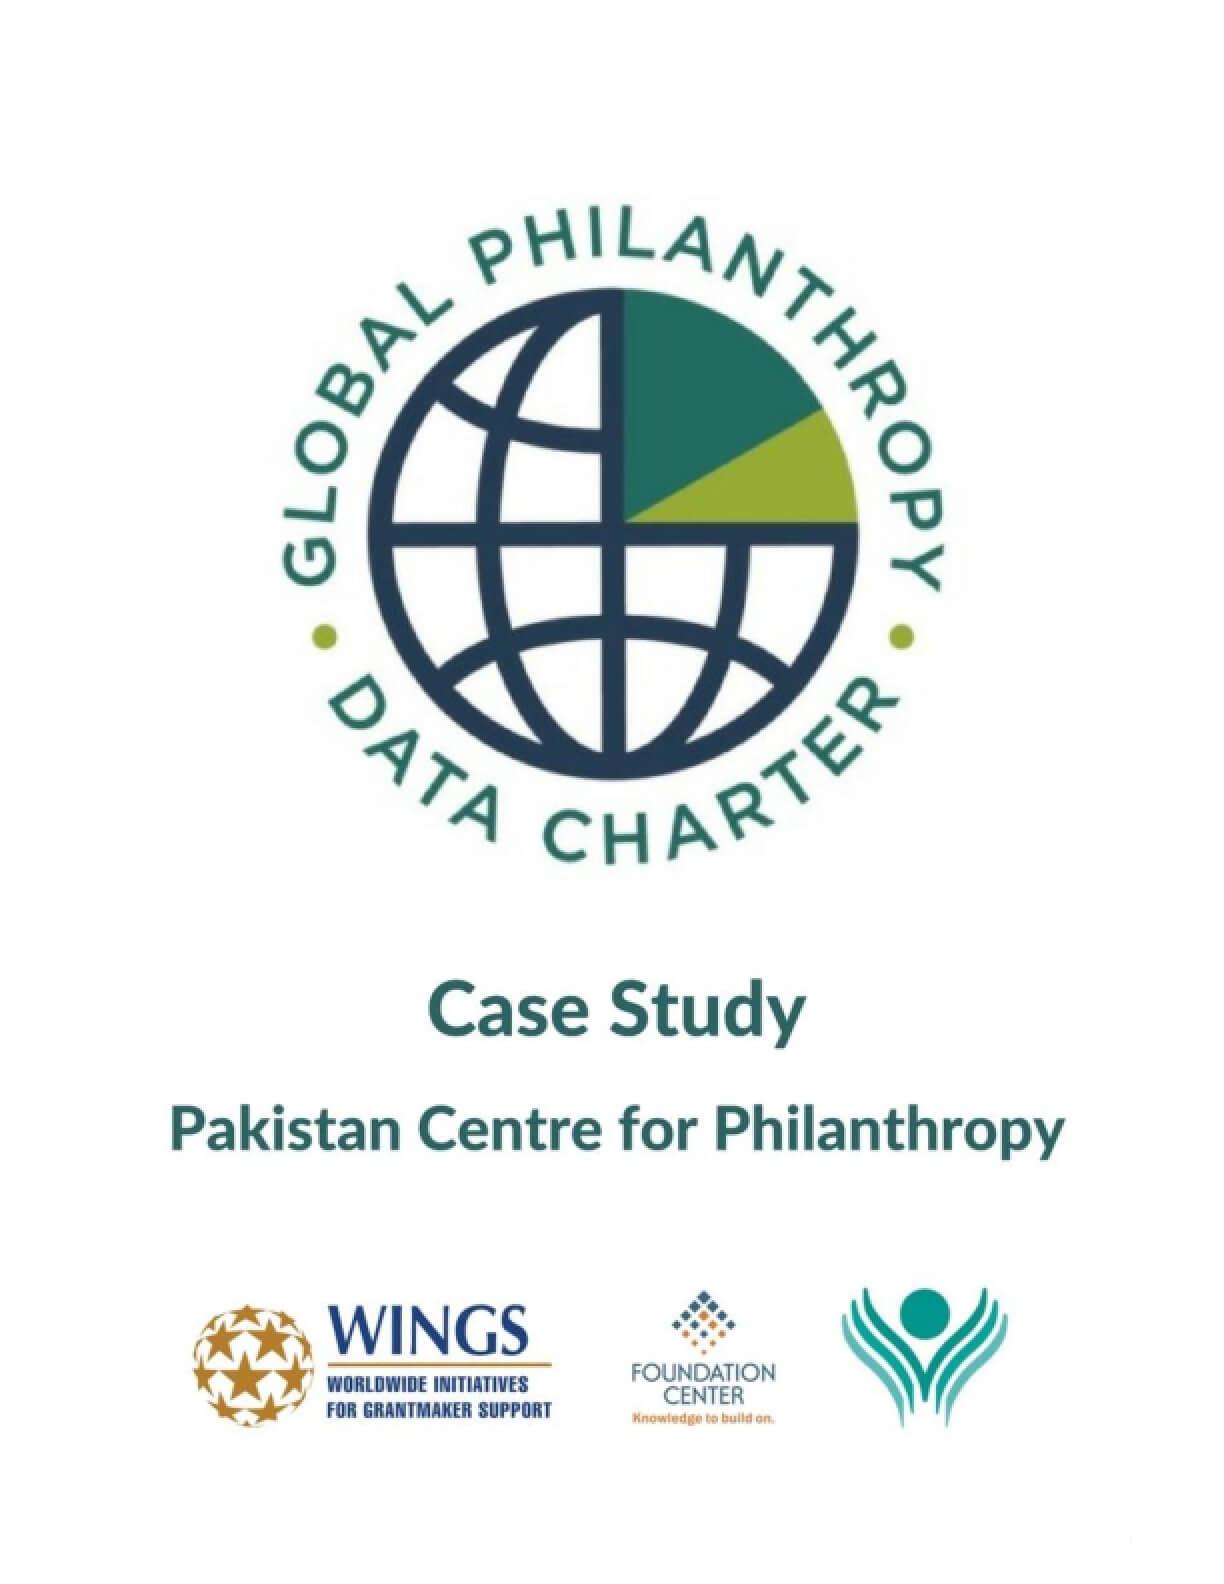 Global Philanthropy Data Charter - Pakistan Centre for Philanthropy Case Study